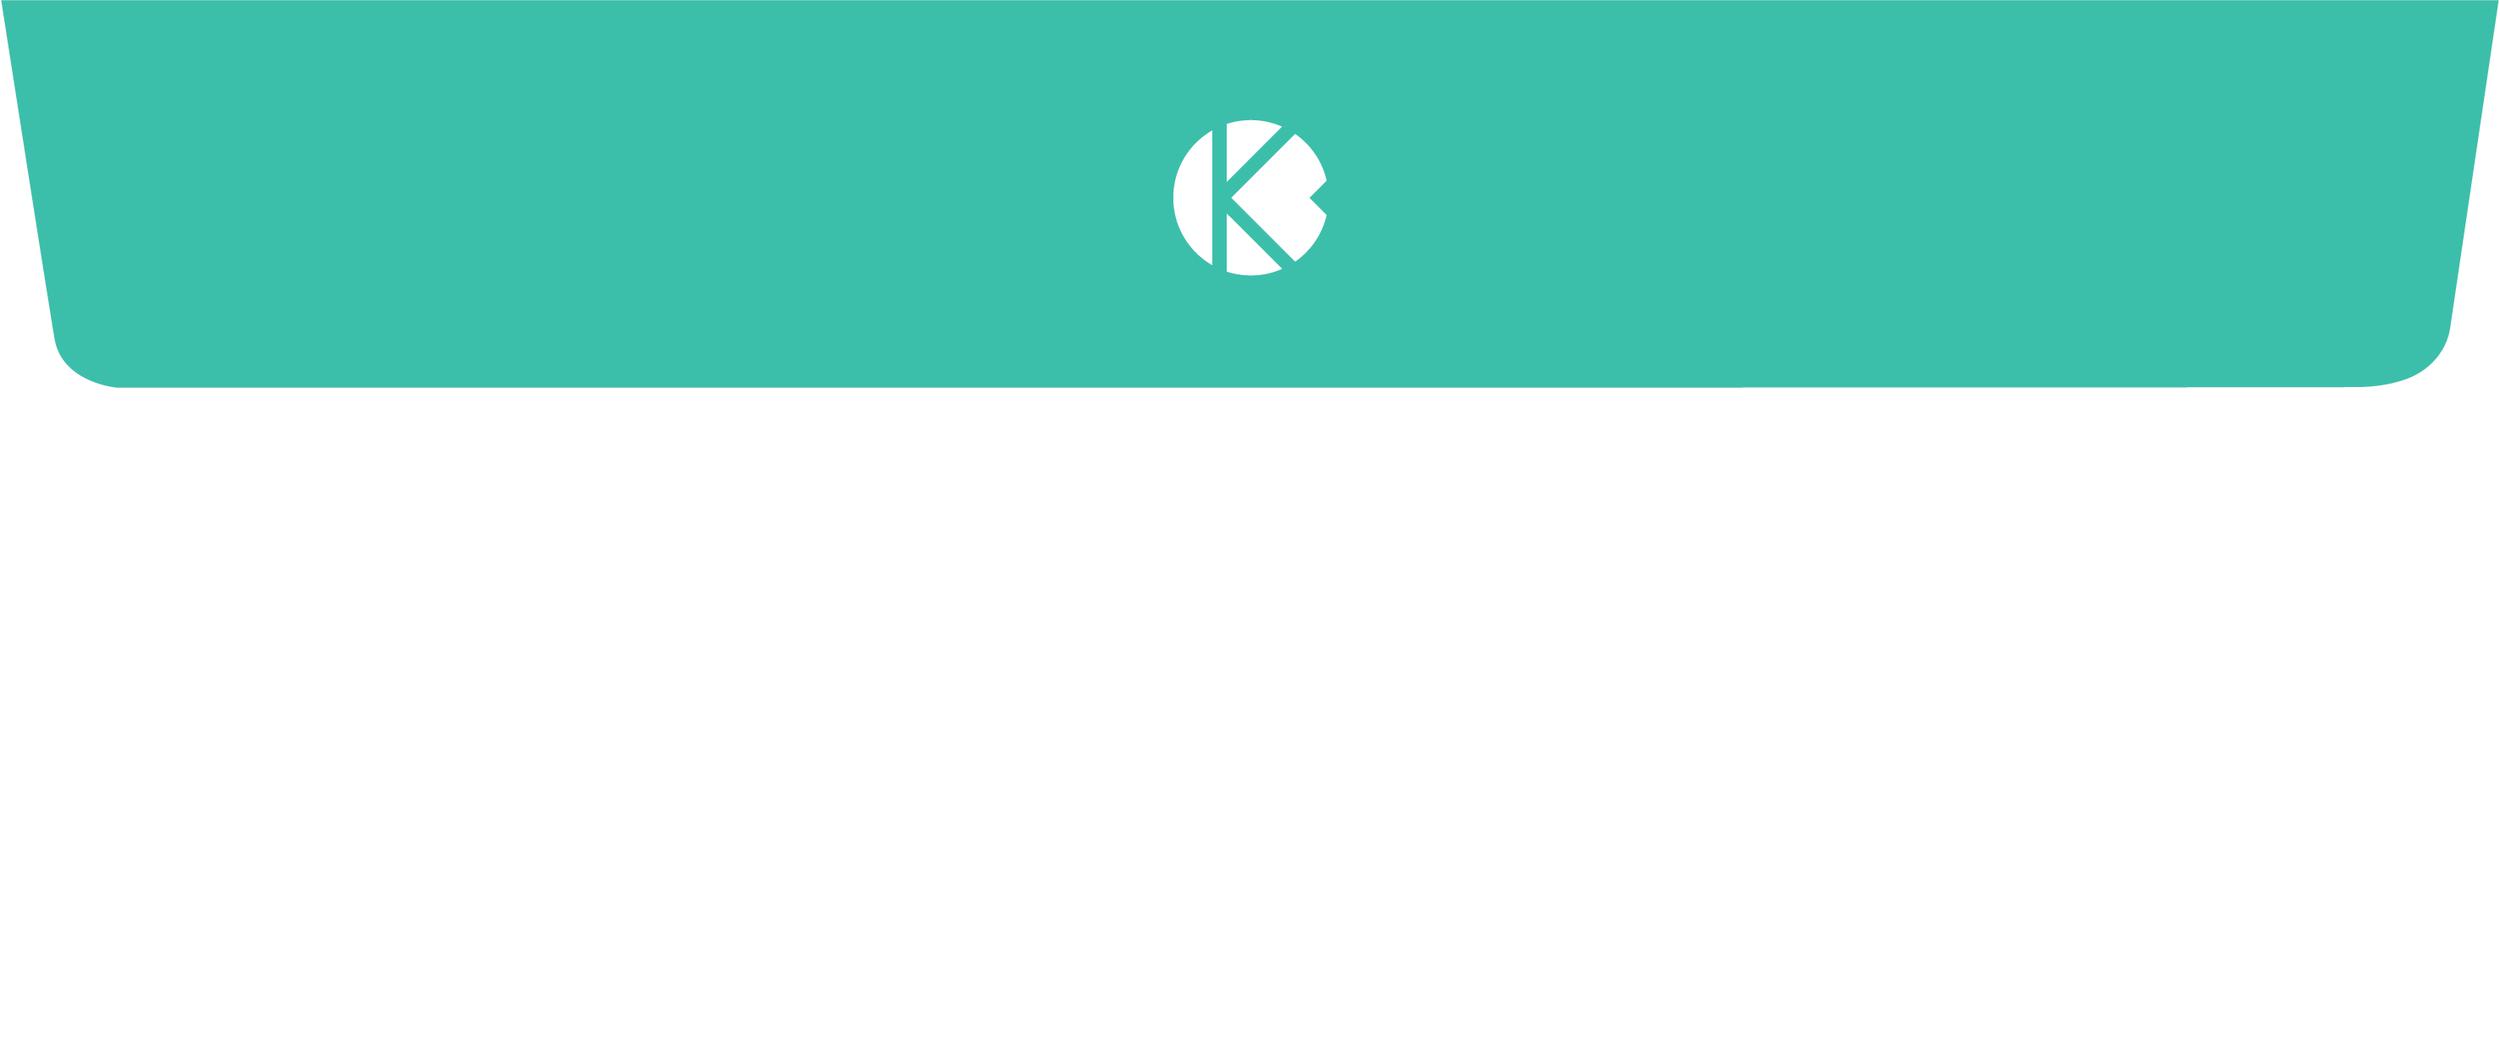 Kingo_Letterhead-Business Mail_Kingo Business Mail B.png